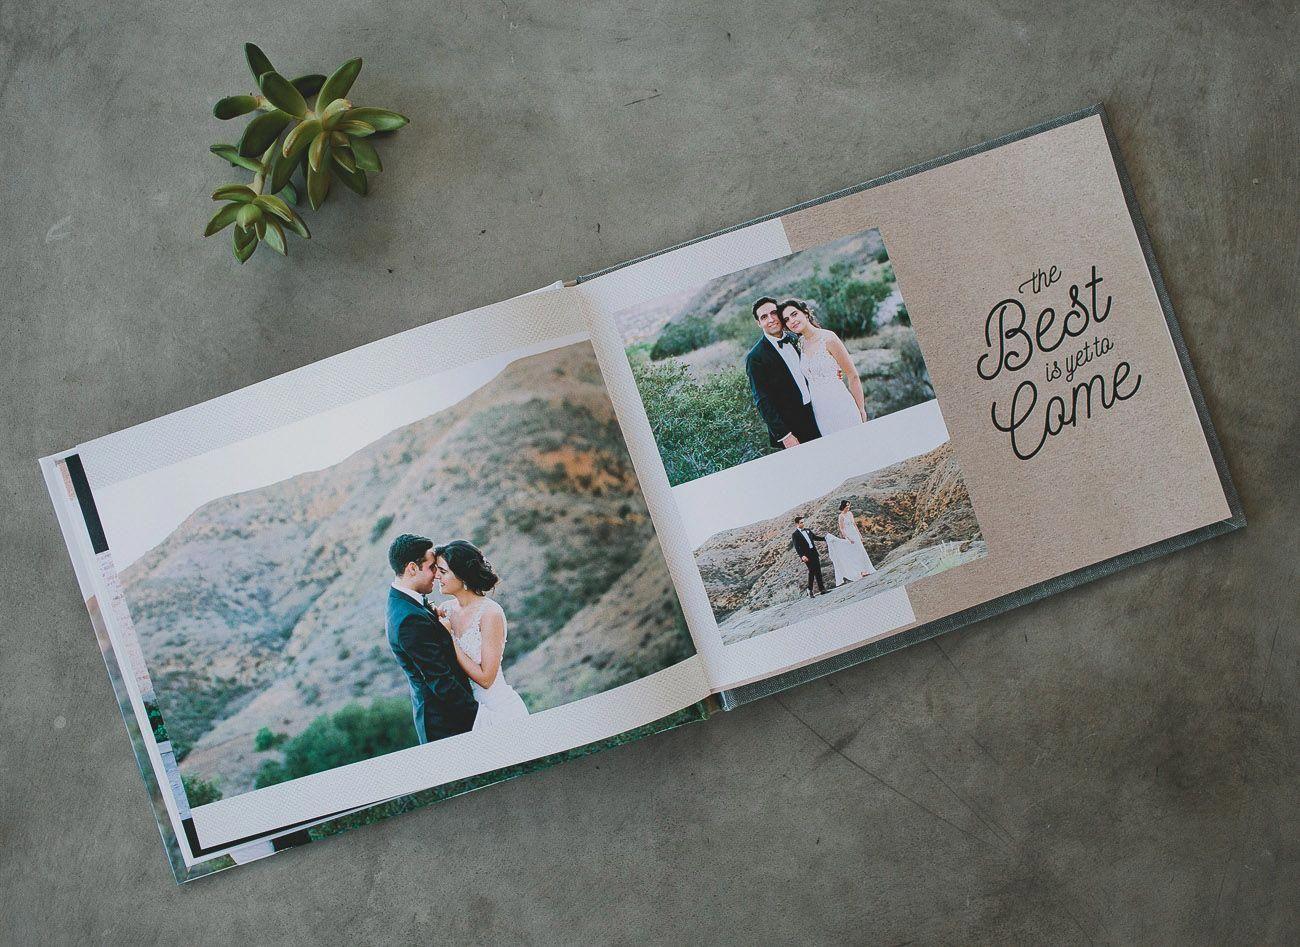 24 Incredible Wedding Album Cover Wedding Album Blue Cameracult Cameraaddict Weddingalbums Wedding Photo Books Wedding Album Layout Photo Album Layout